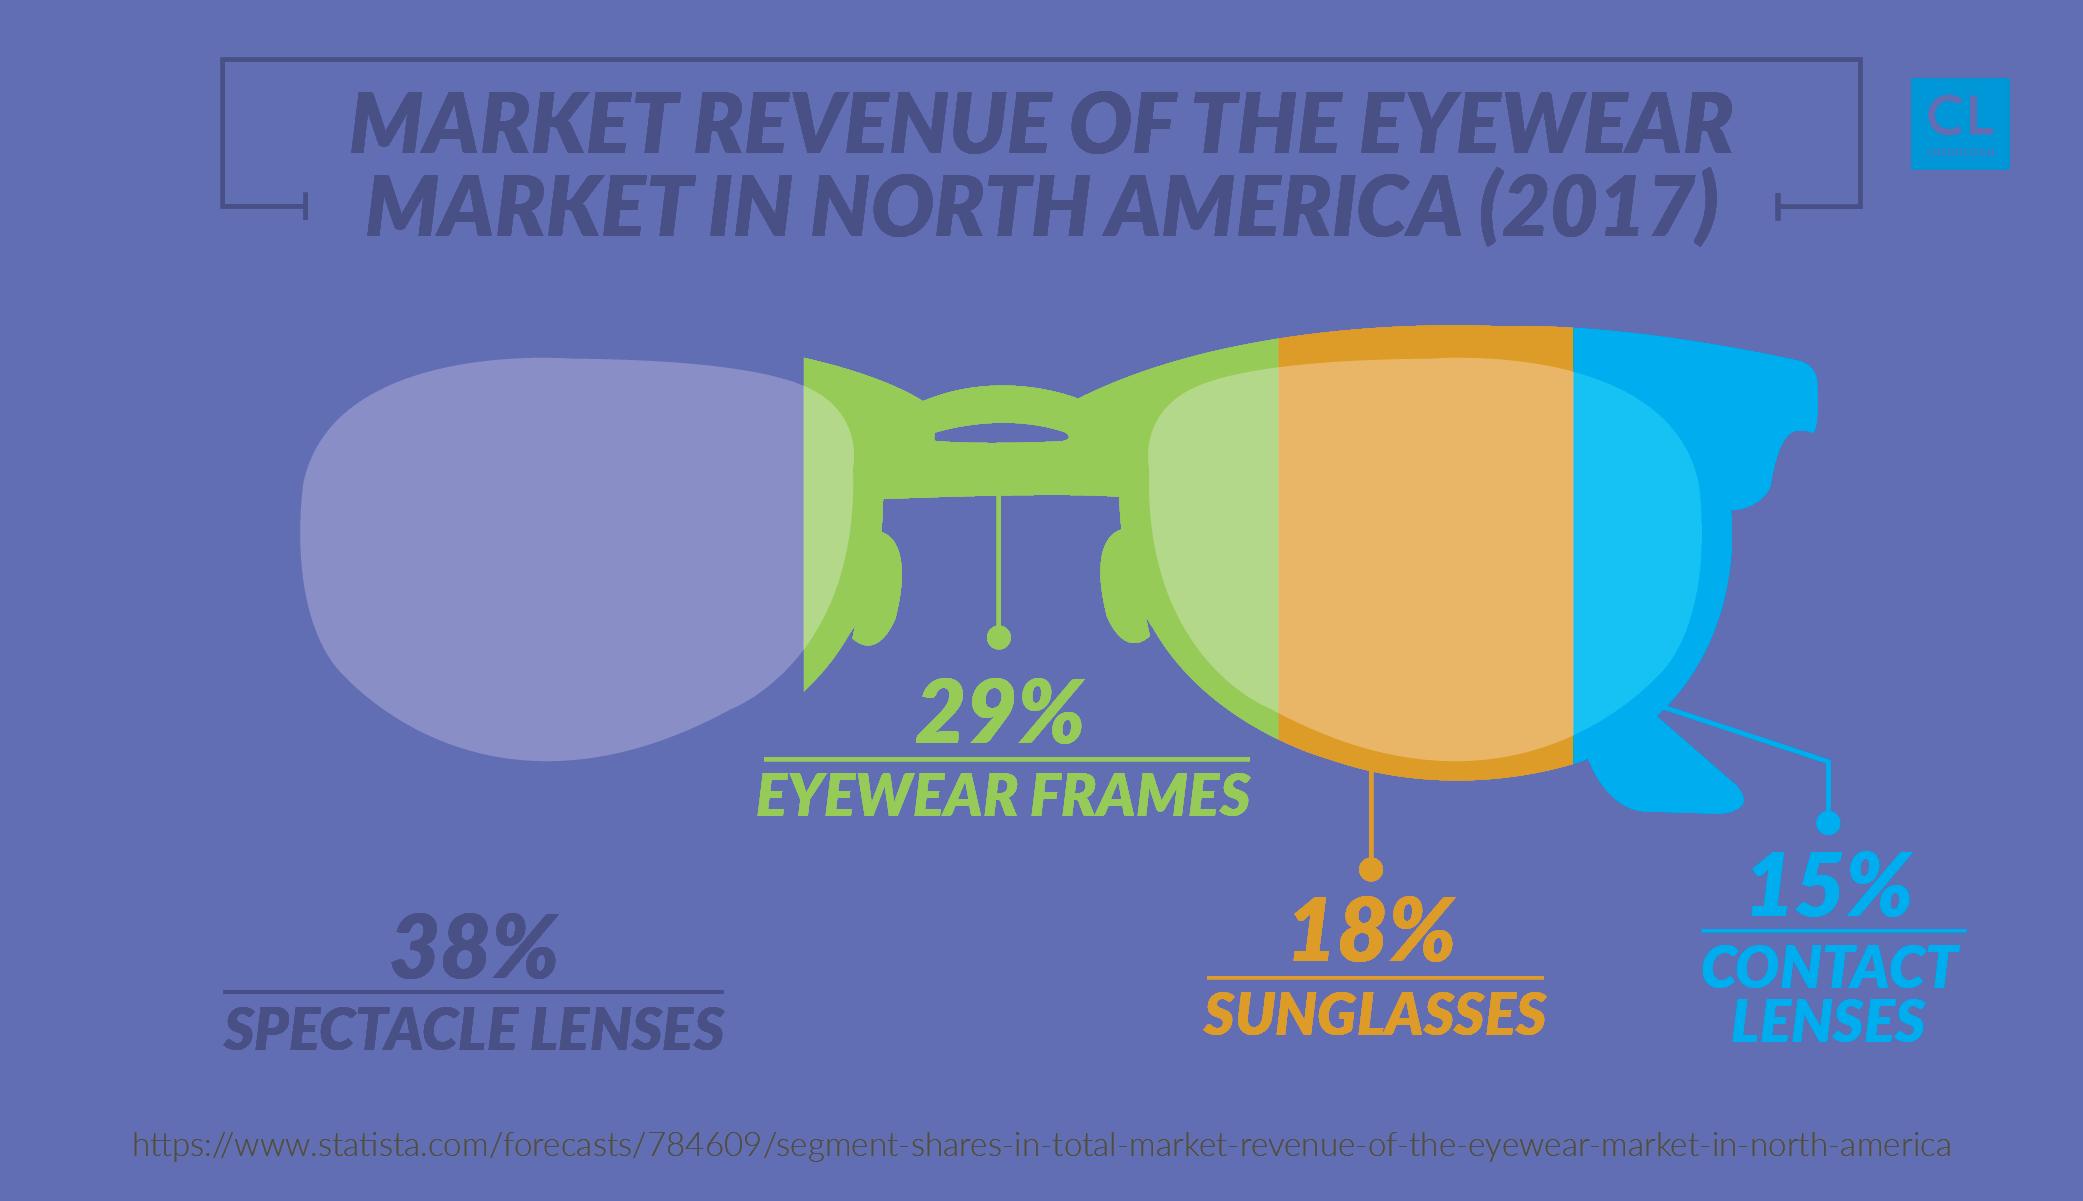 Market Revenue of the Eyewear Market in North America